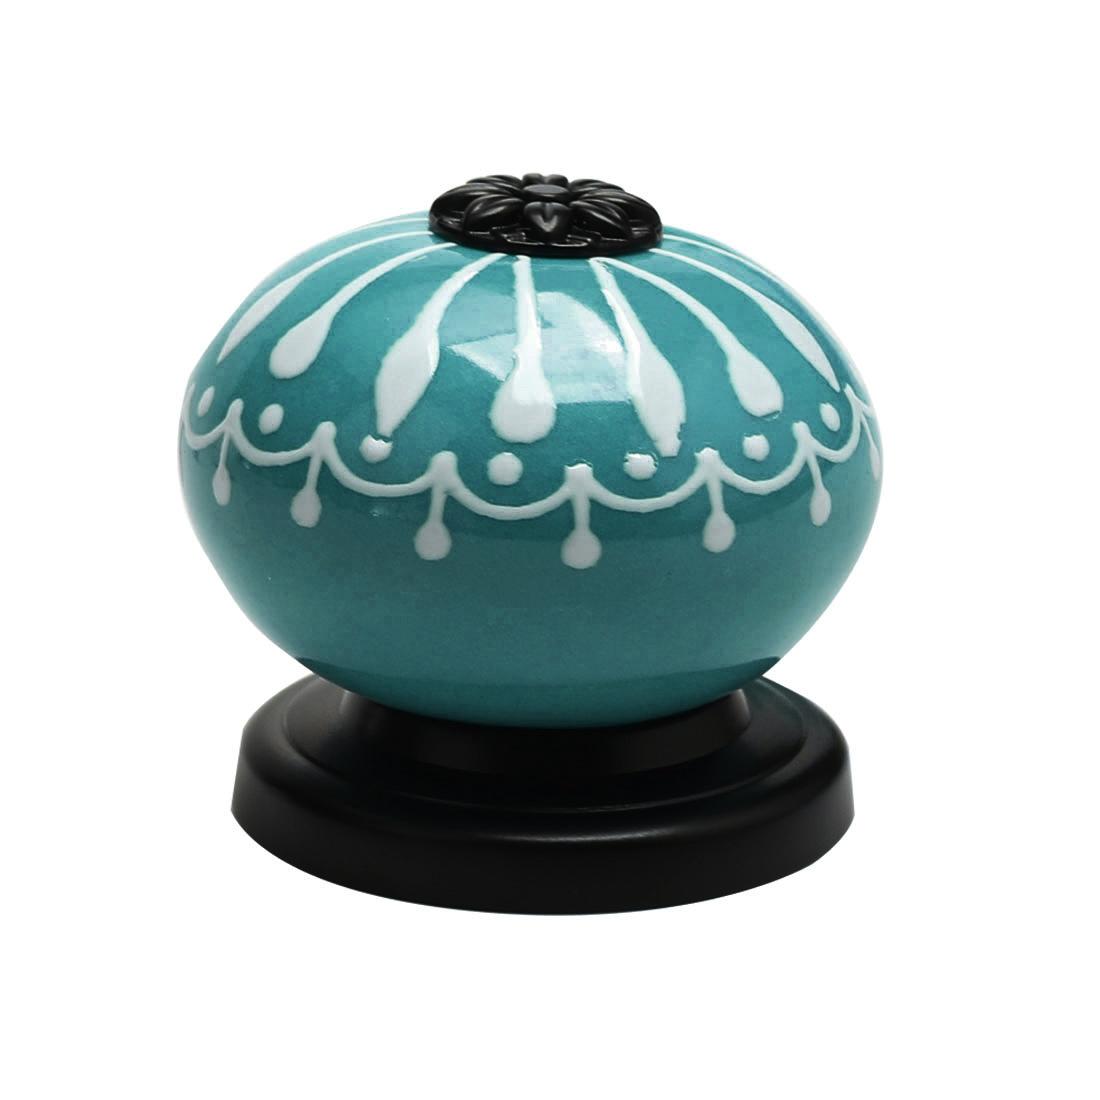 Ceramic Knob Pull Handle Dresser Cupboard Wardrobe Cabinet Door Accessories Blue